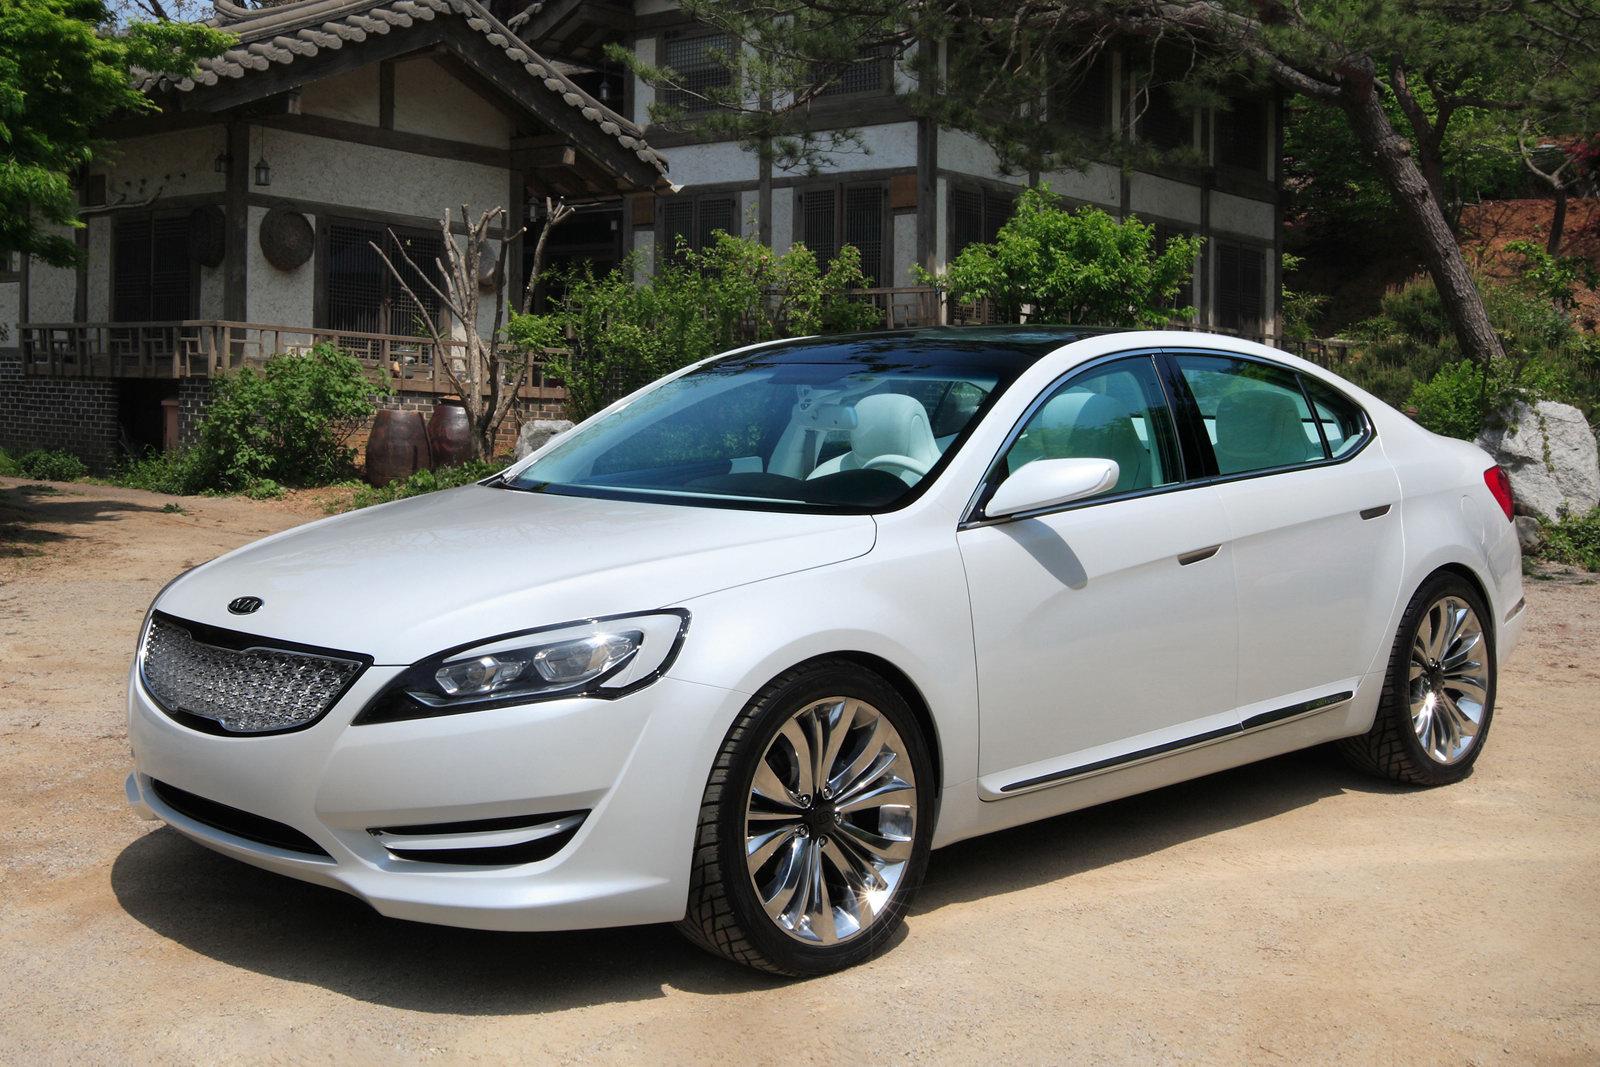 Kia Cadenza 2011 >> Kia KND-5 Concept img_3   It's your auto world :: New cars, auto news, reviews, photos, videos ...